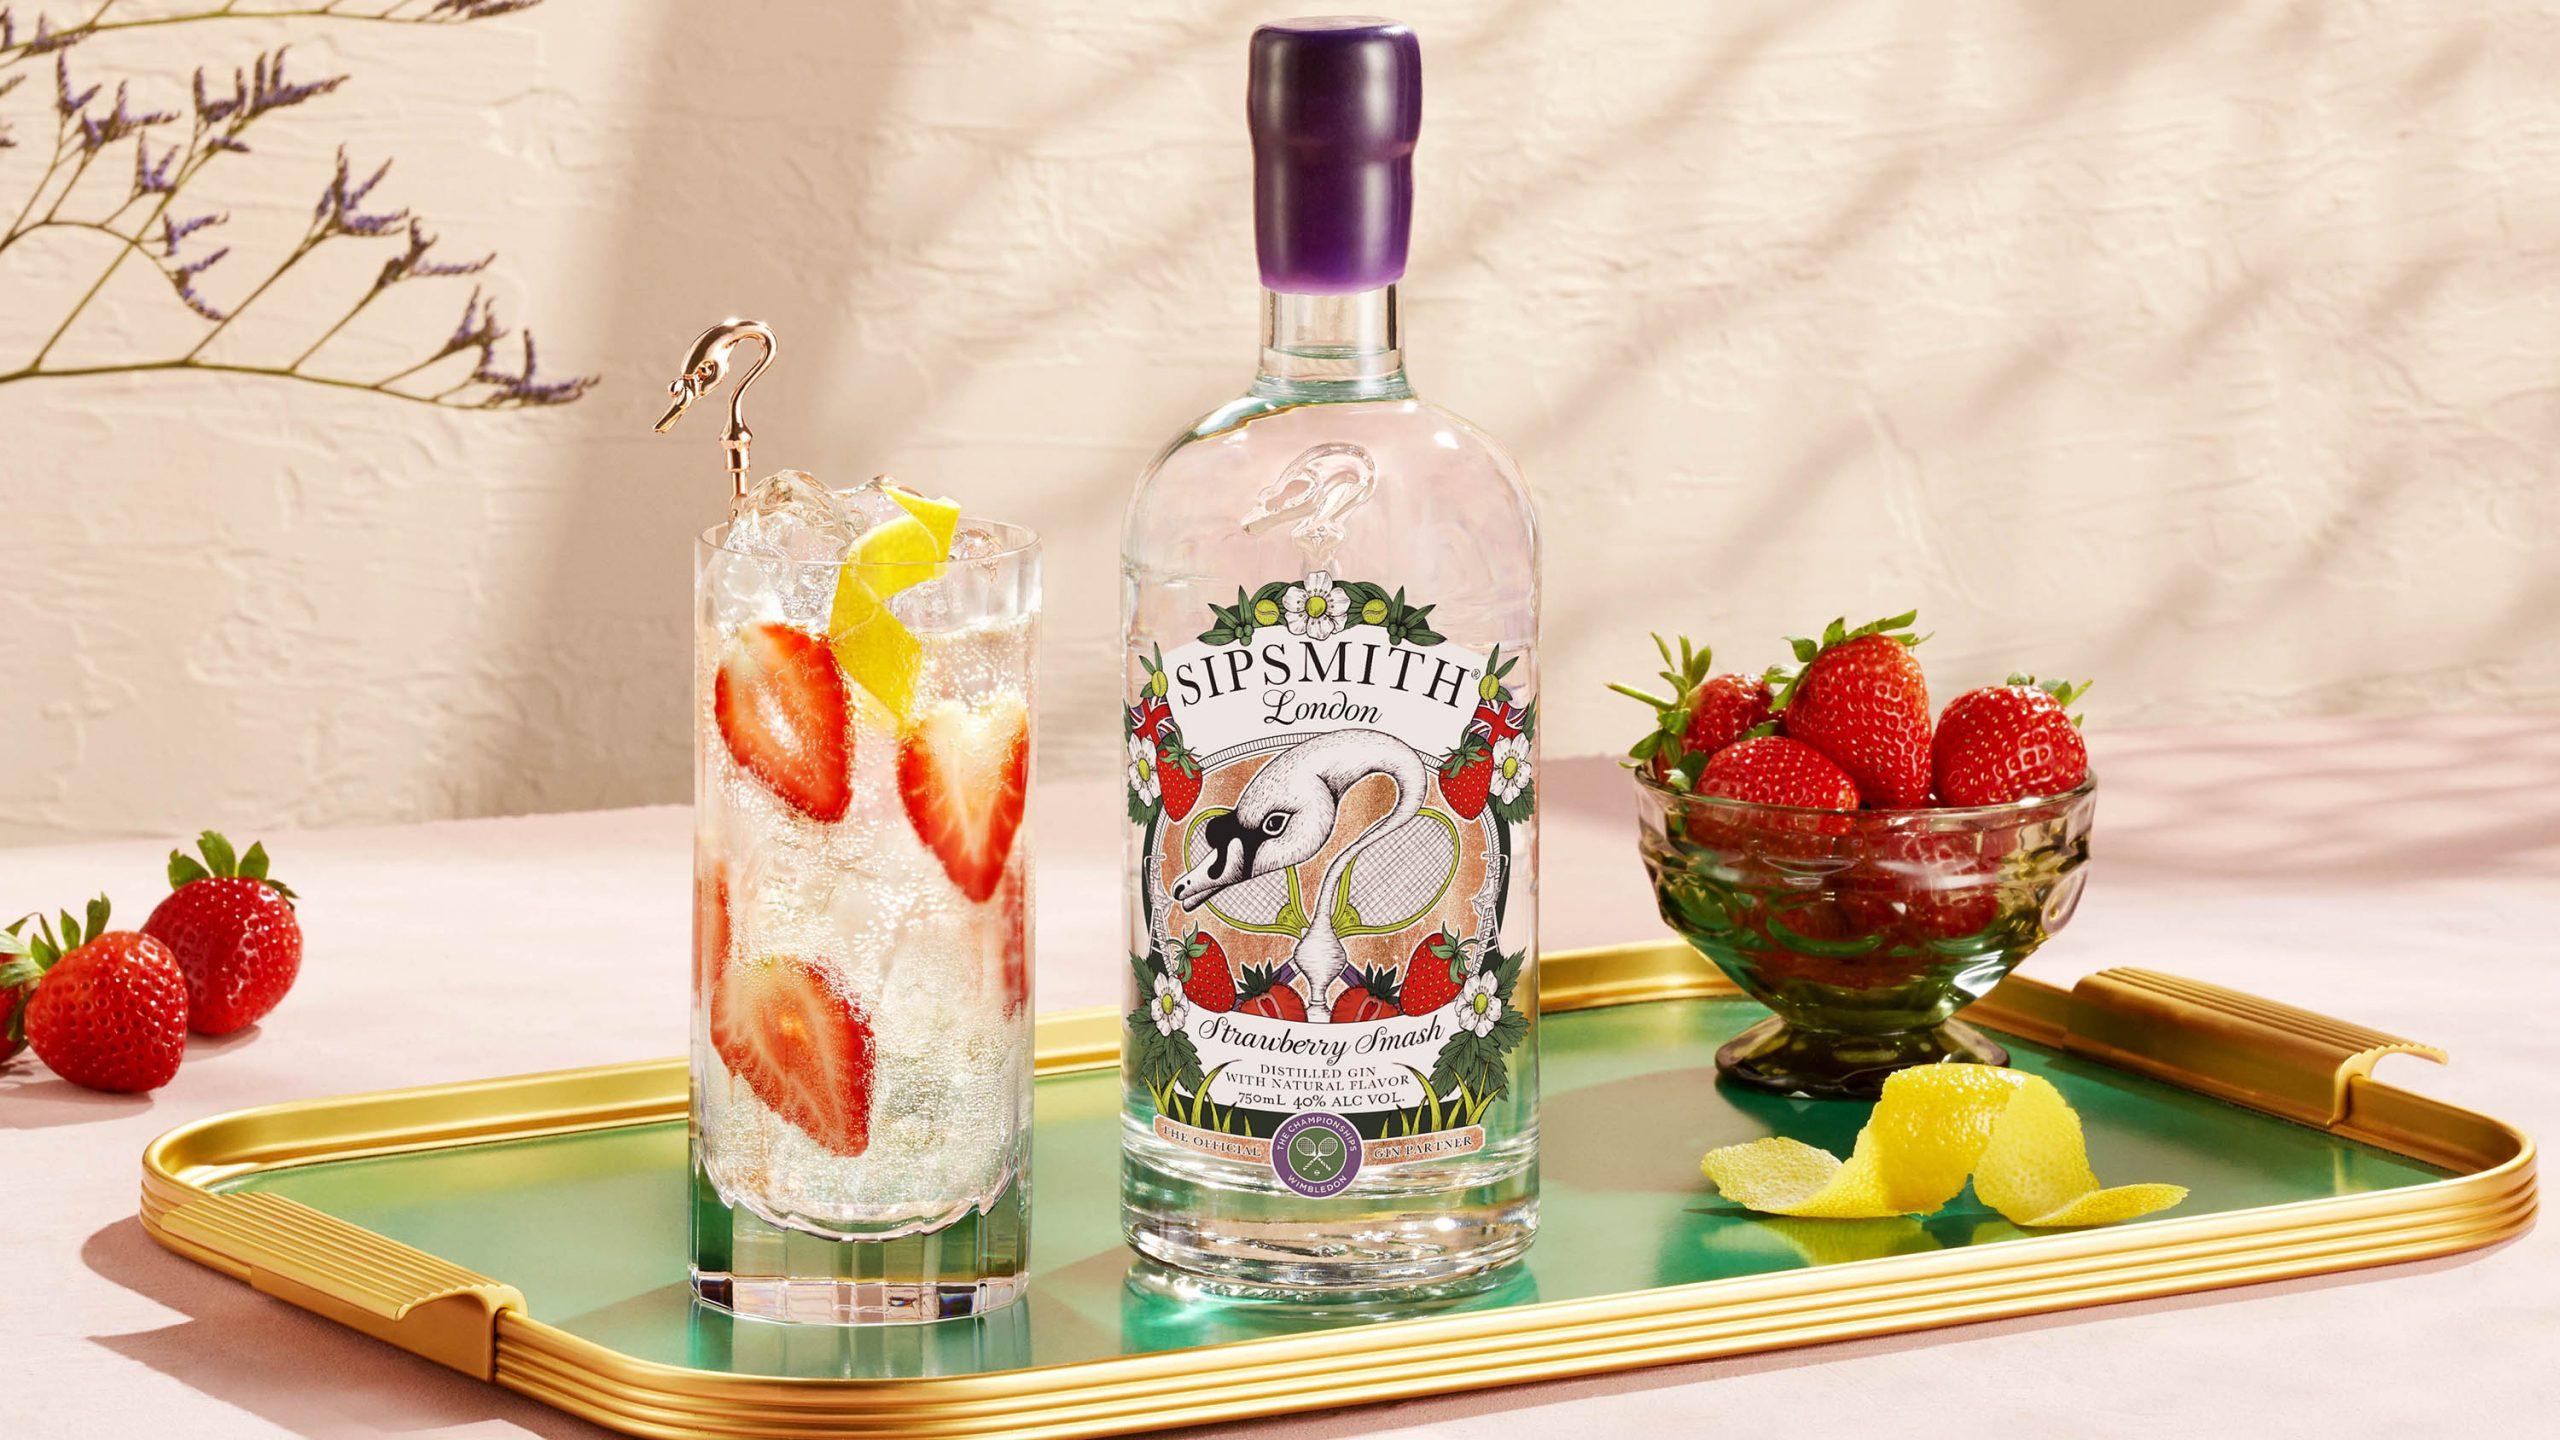 Wimbledon Sipsmith Strawberry Smash Gin Collins